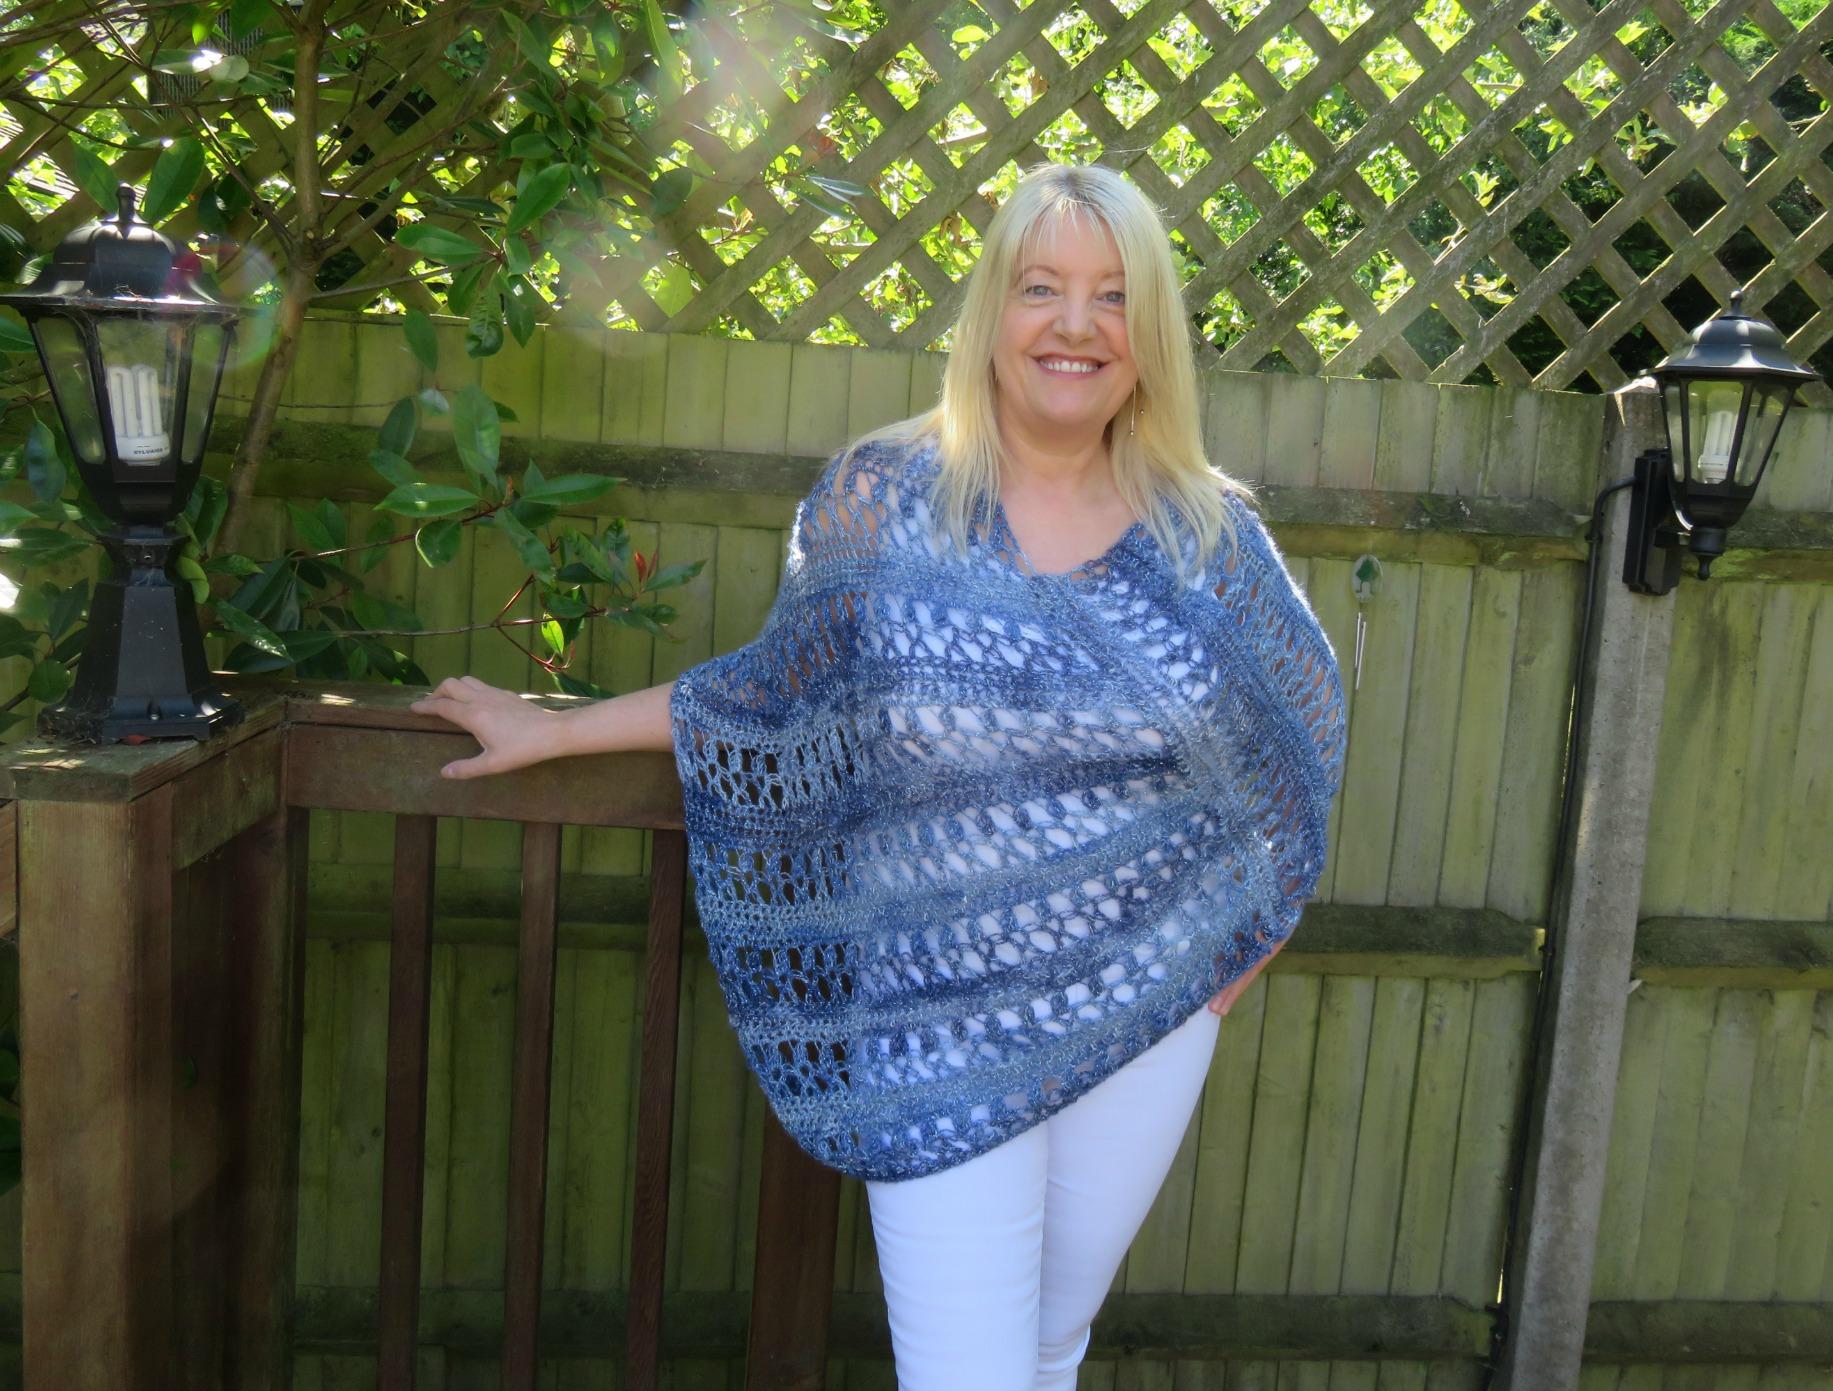 Ocean Kiss Summer Poncho Crochet Pattern - Crochet 24/7